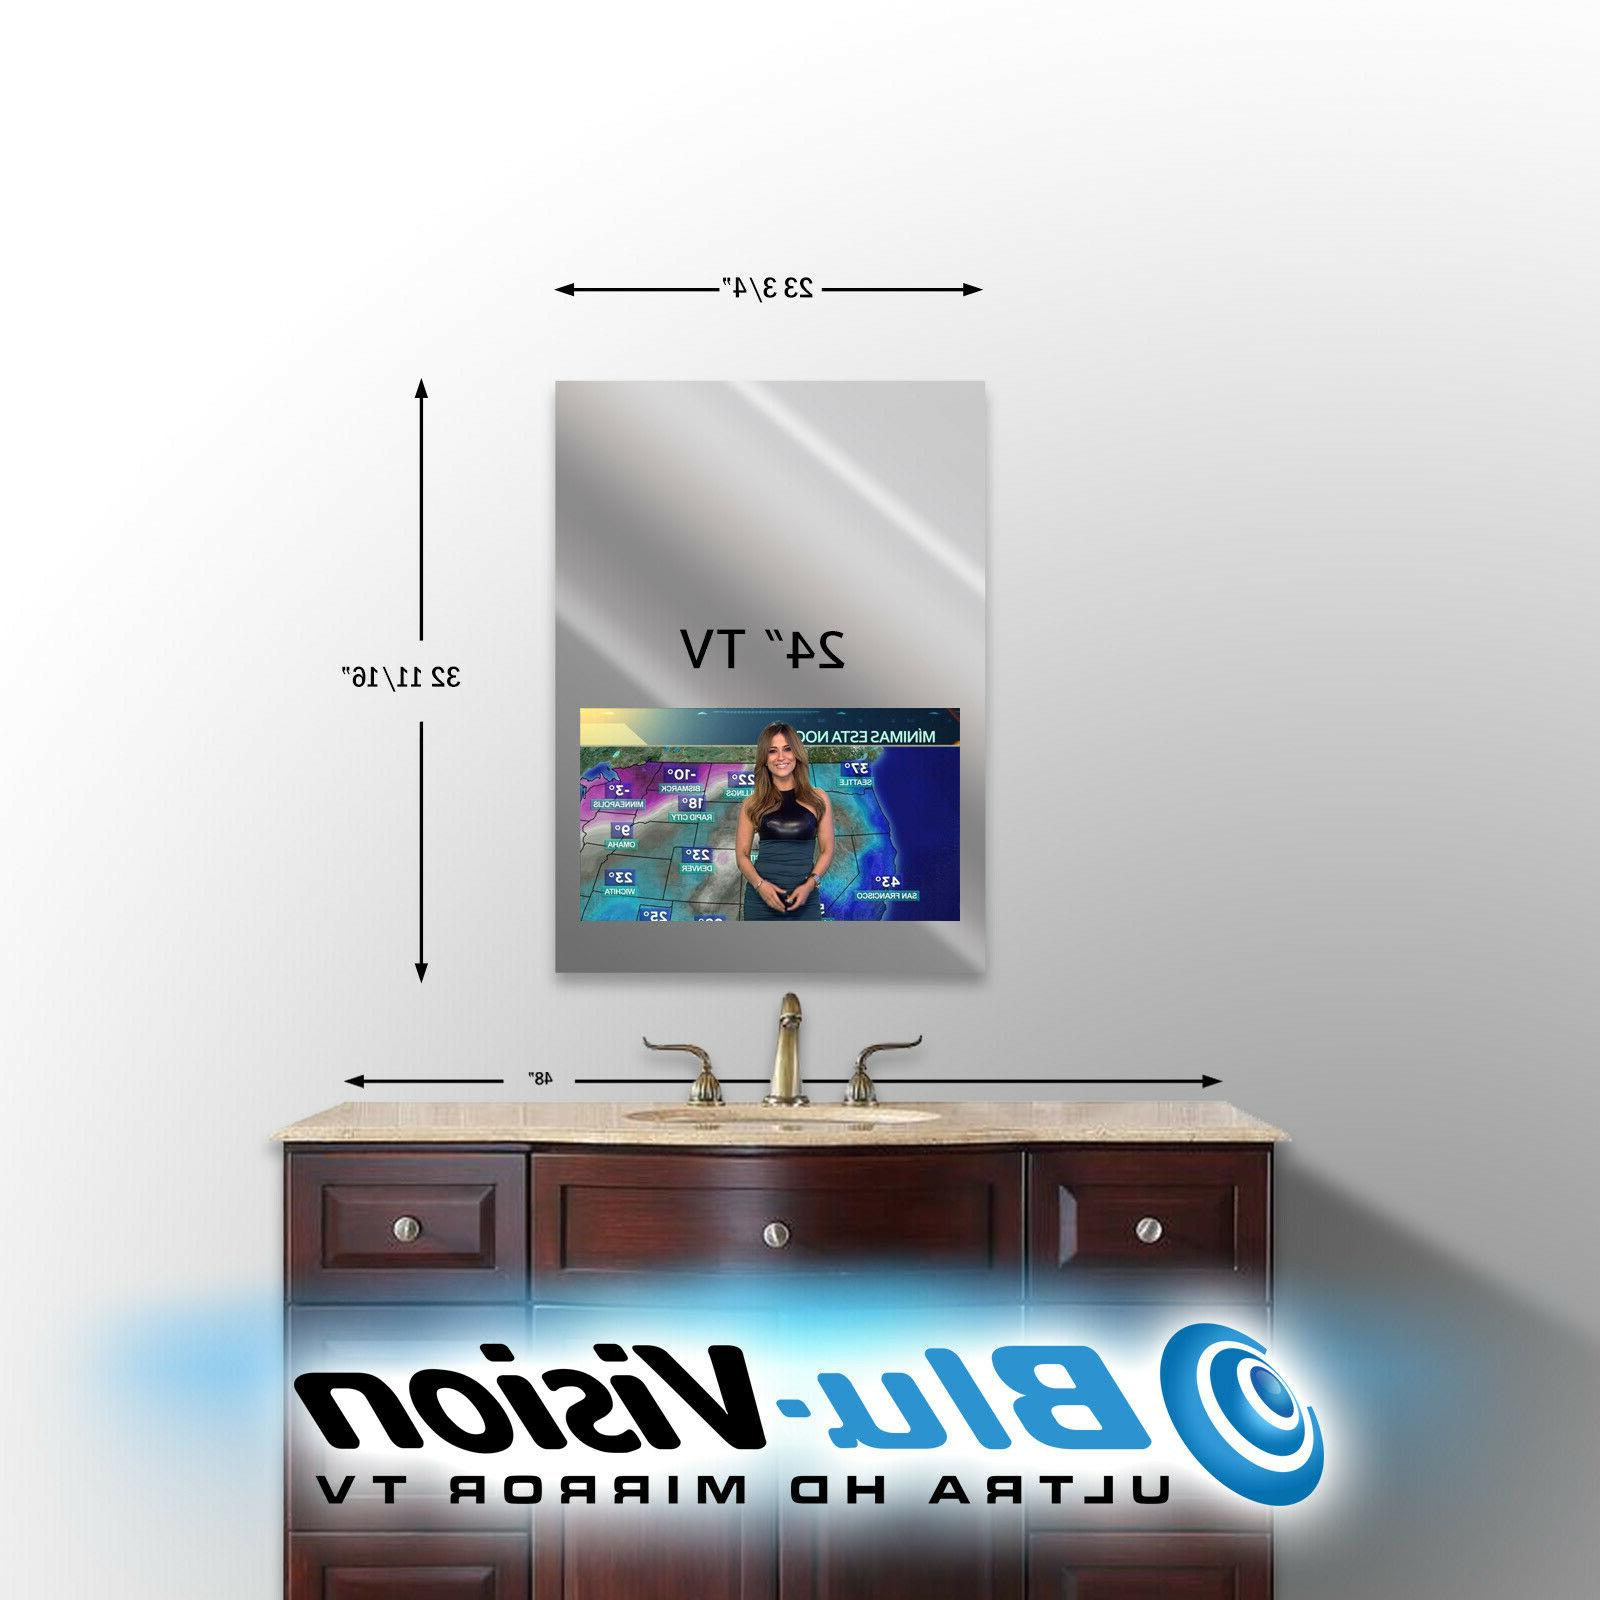 "MIRROR TV LG 24"" CLASS LED SMART 1080p HDTV 23 3/4""W X 3"